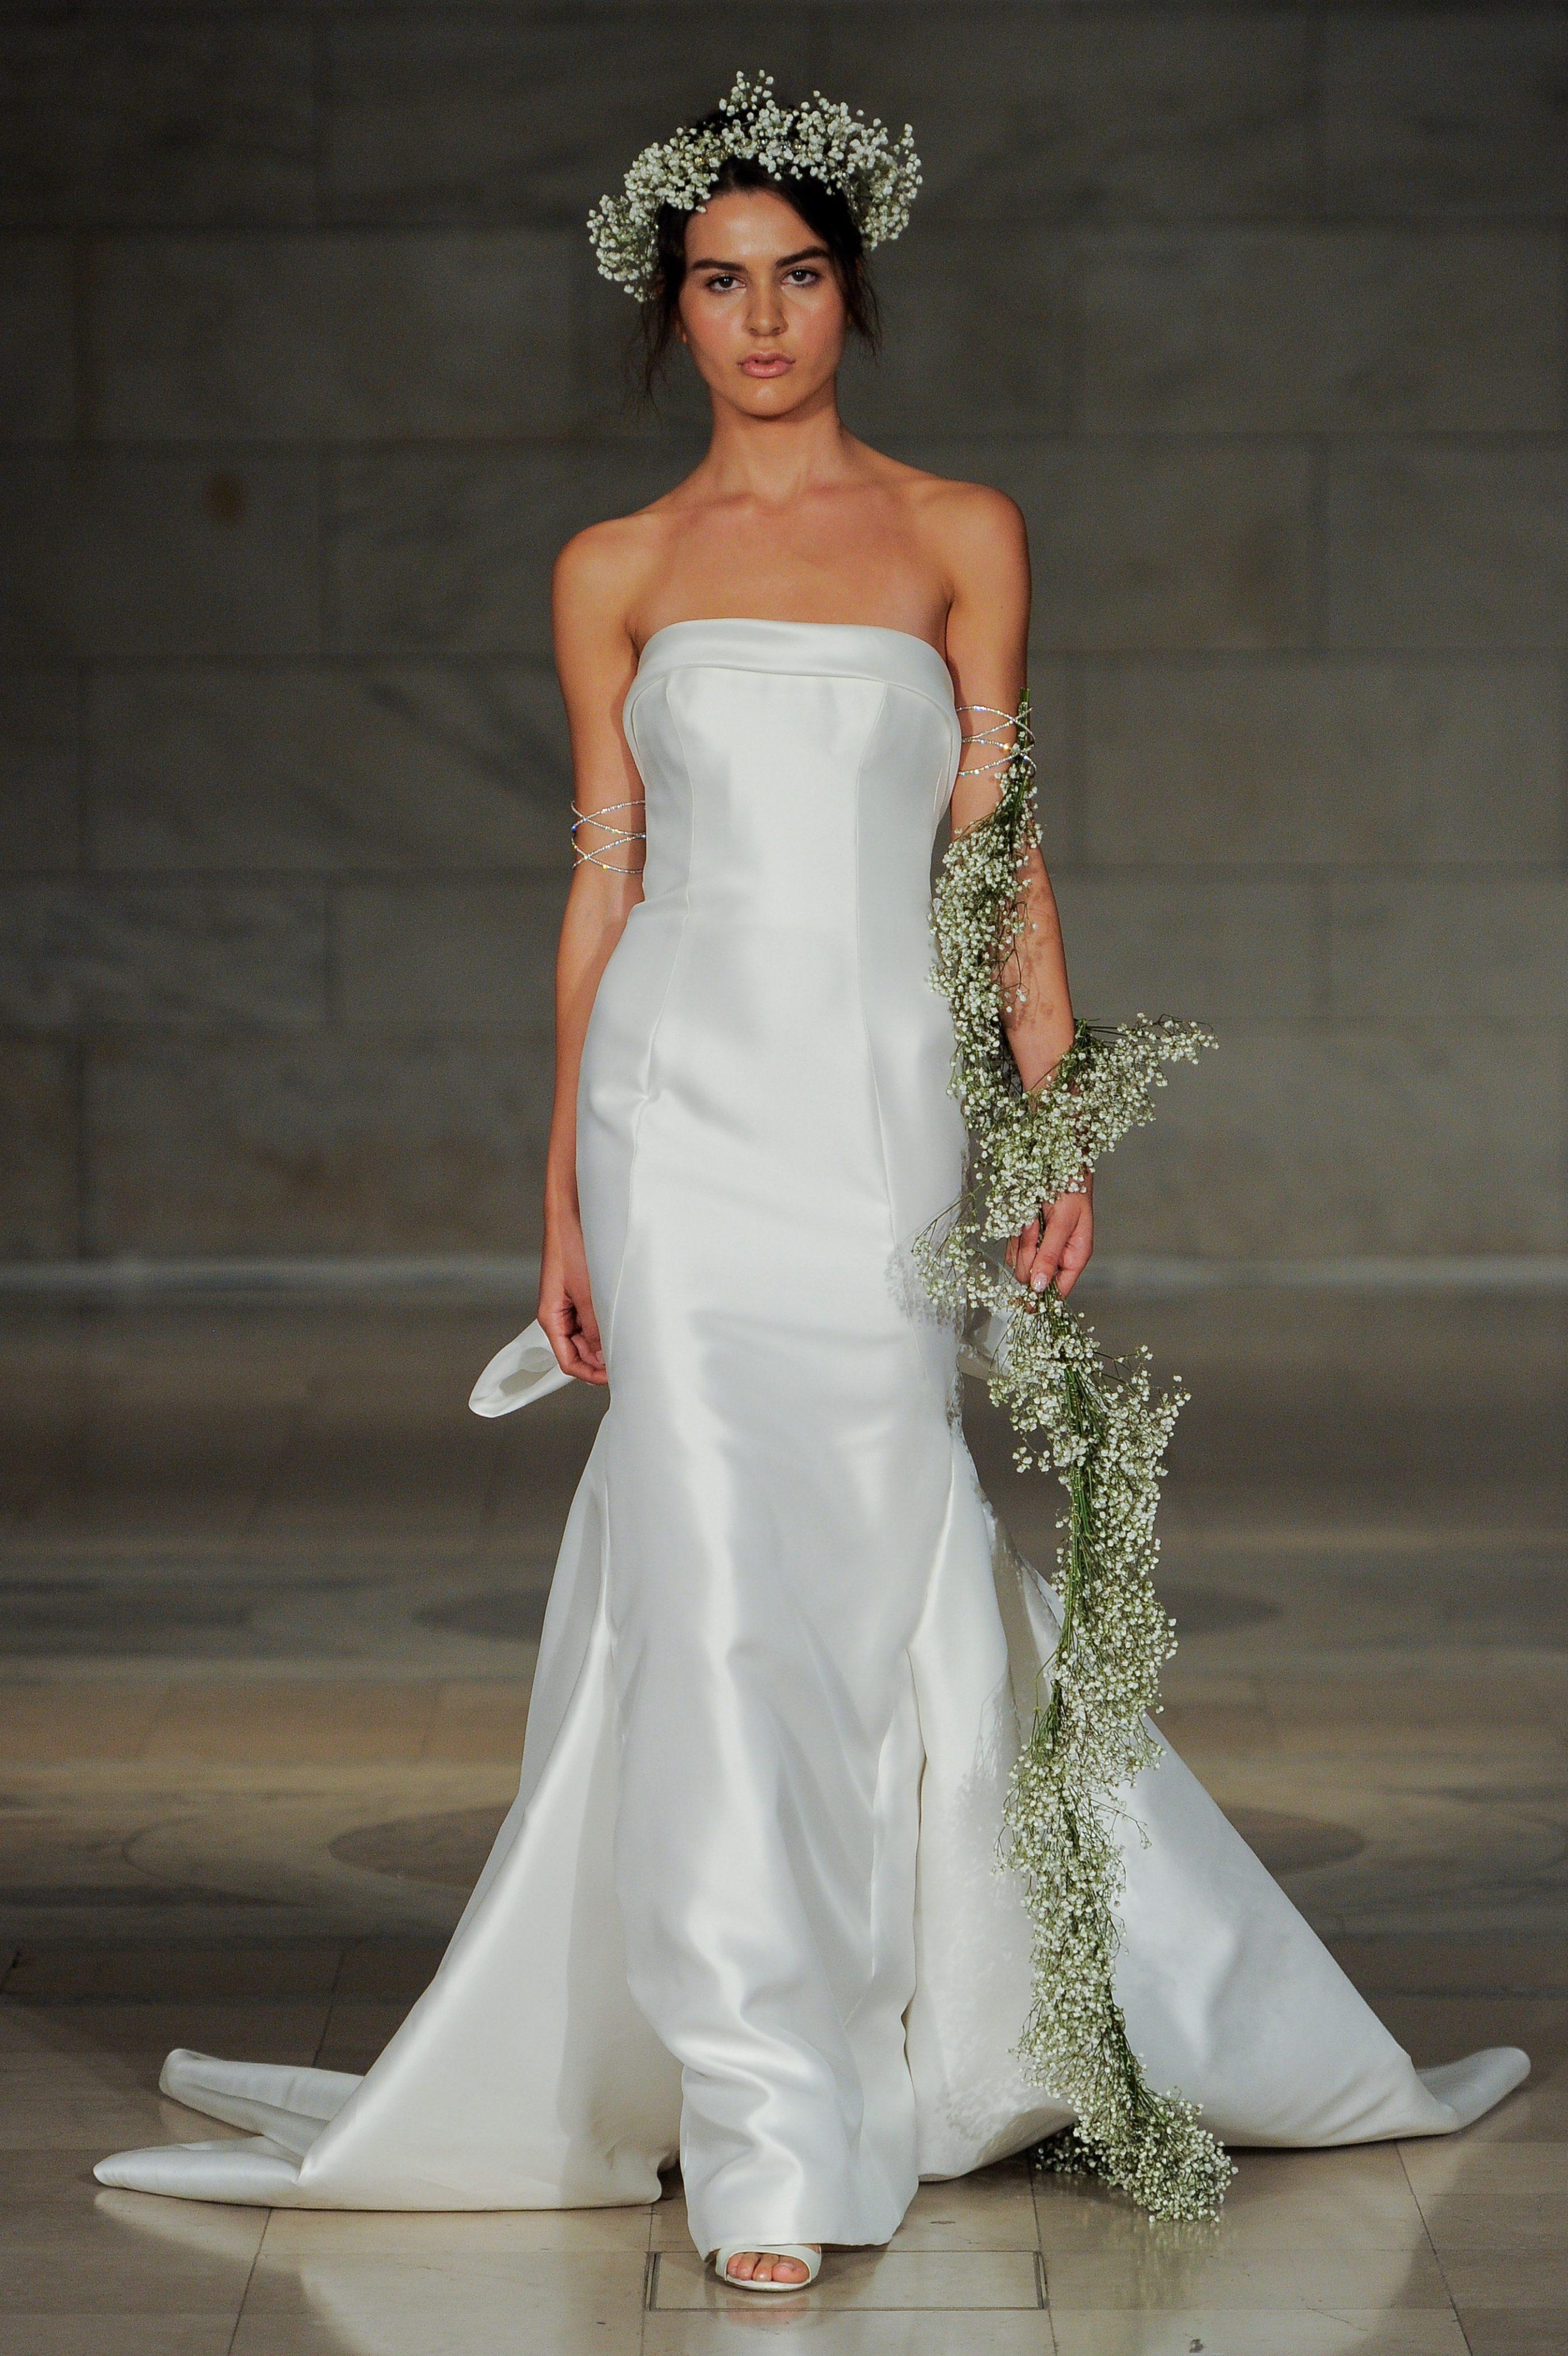 Strapless Simple Straight Neckline Mermaid Wedding Dress | Kleinfeld ...